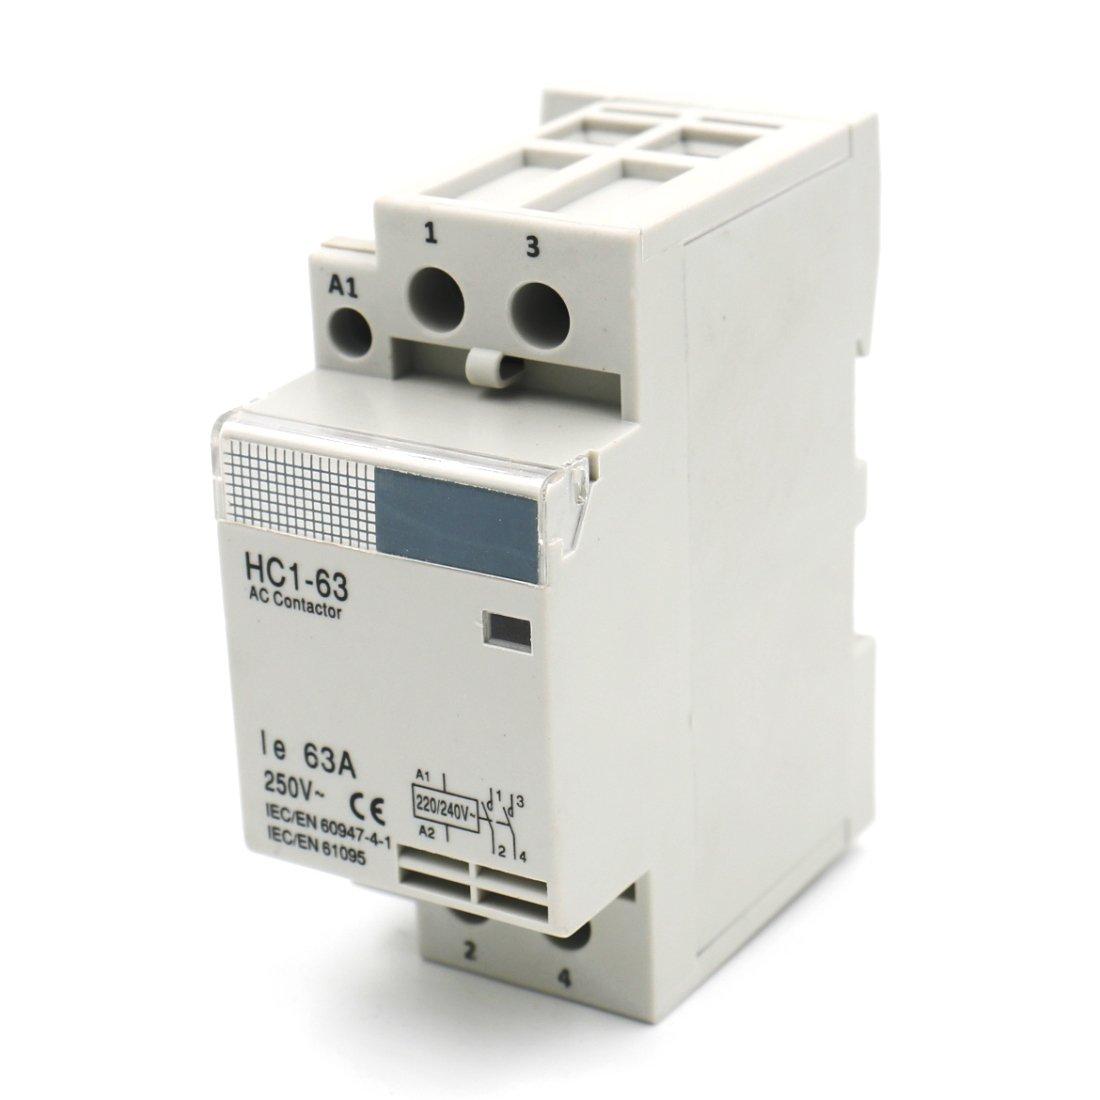 Baomain AC Contactor HC1-63 220V 63A 2 Pole Universal Circuit Control DIN Rail Mount